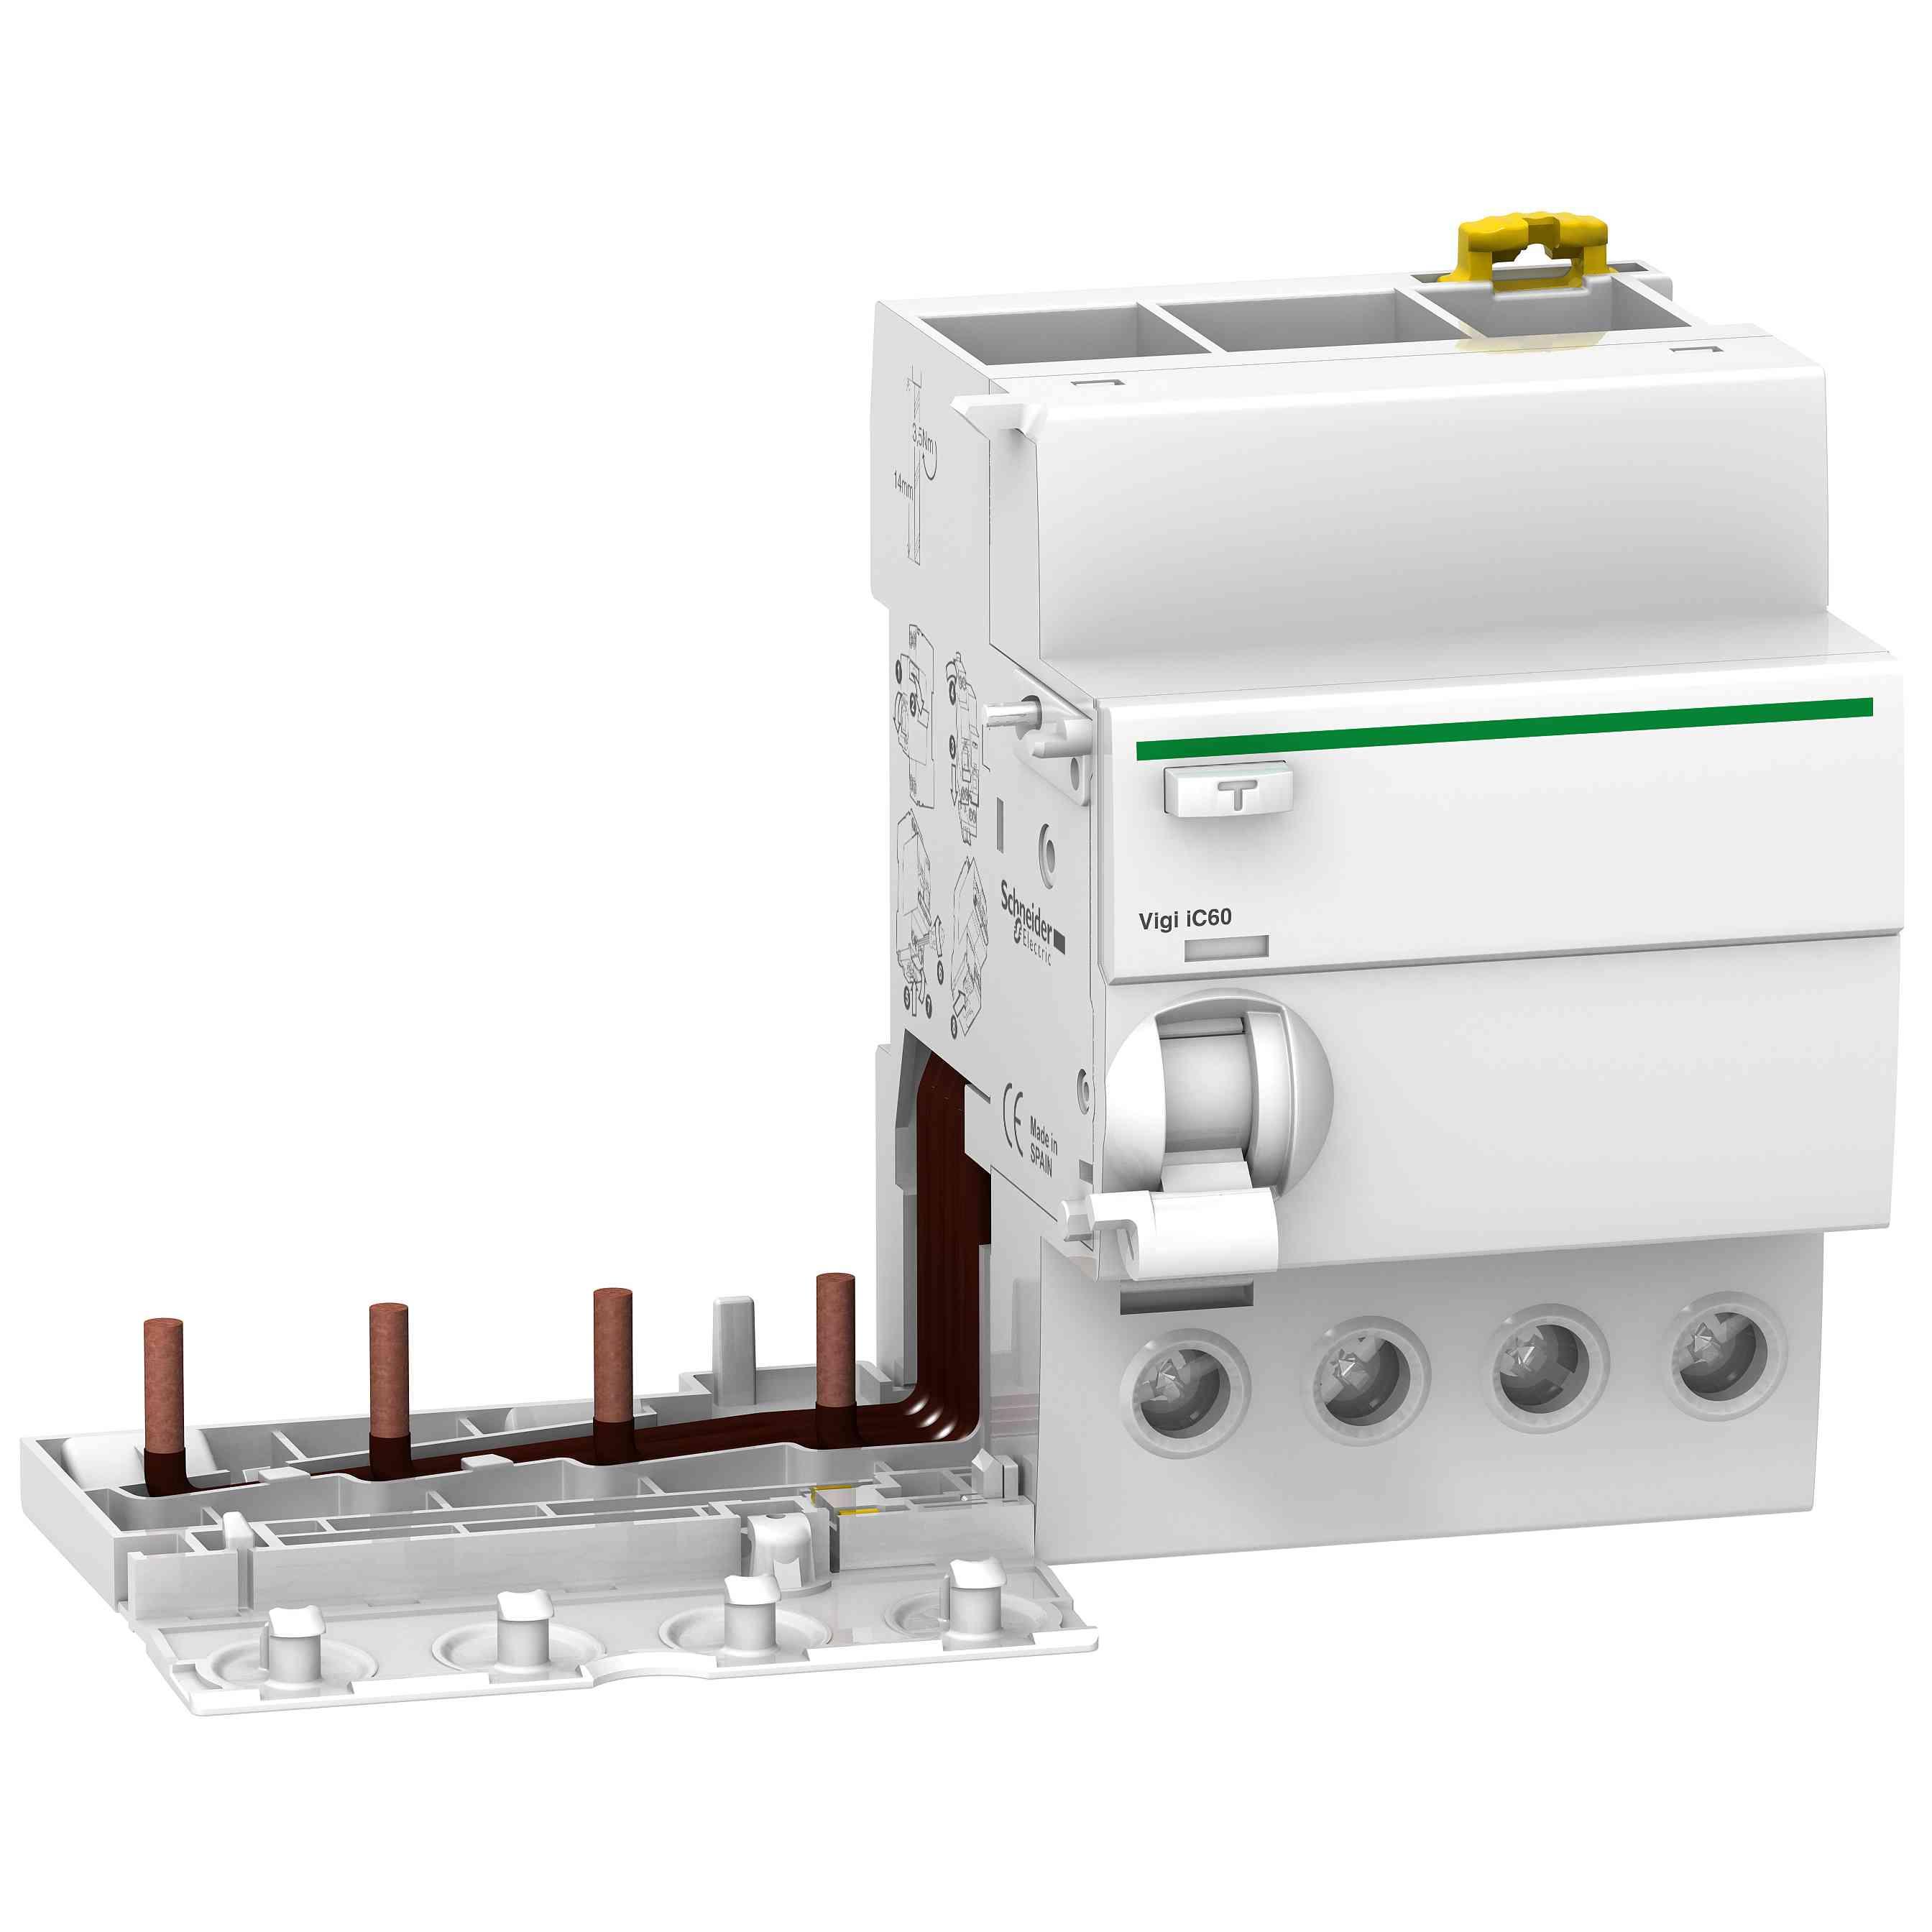 Vigi iC60 - ozemljitveni blok - 4P - 40 A - 300 mA - tip AC